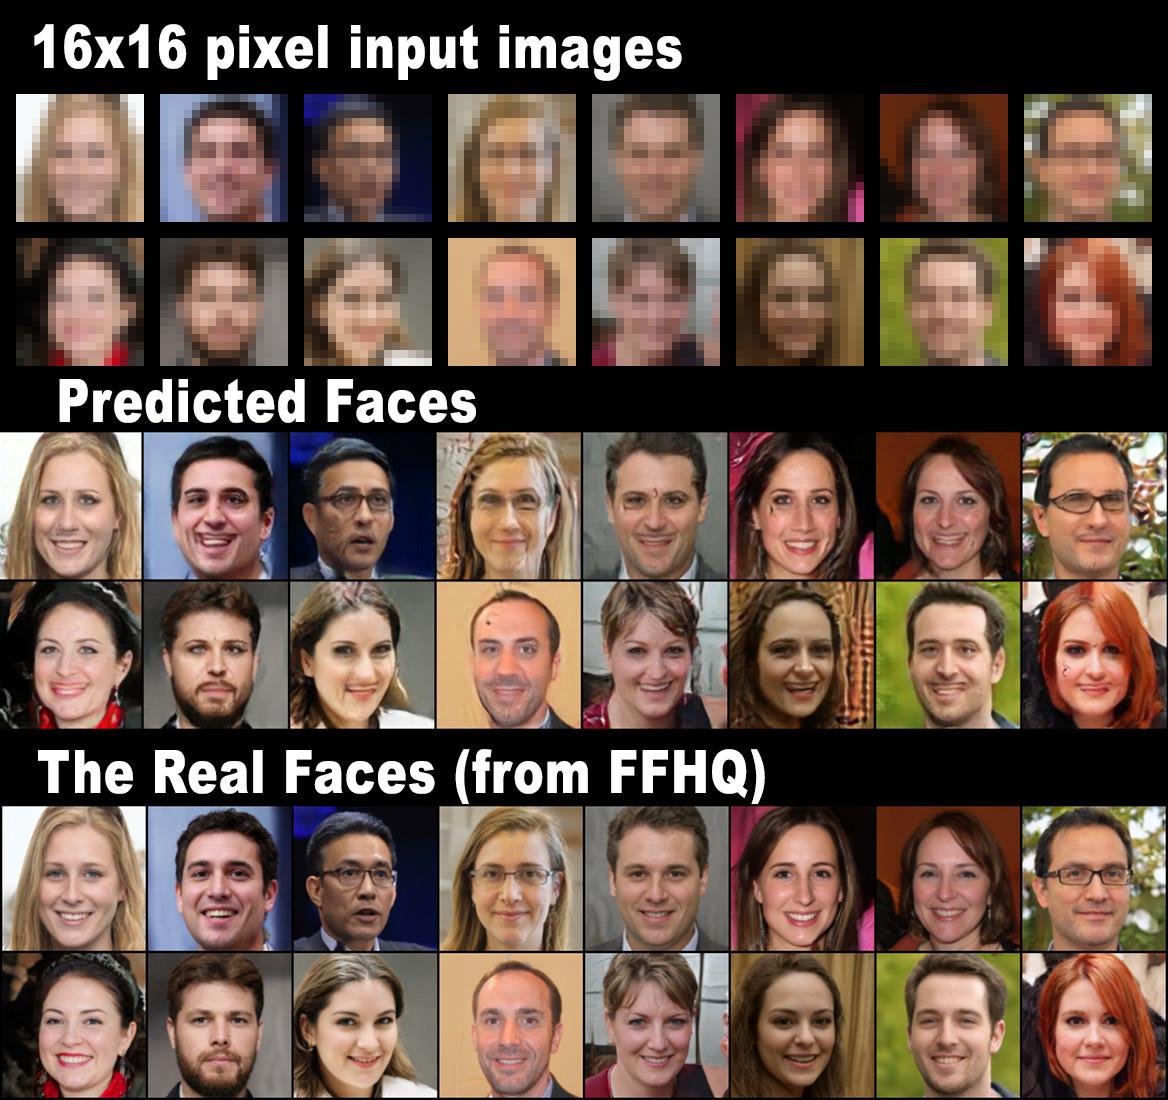 https://cdn.vox-cdn.com/thumbor/yZFVgGmZF1N4GFfgWkexkJaBQ80=/0x0:1168x1100/1720x0/filters:focal(0x0:1168x1100):no_upscale()/cdn.vox-cdn.com/uploads/chorus_asset/file/19164991/examples.png